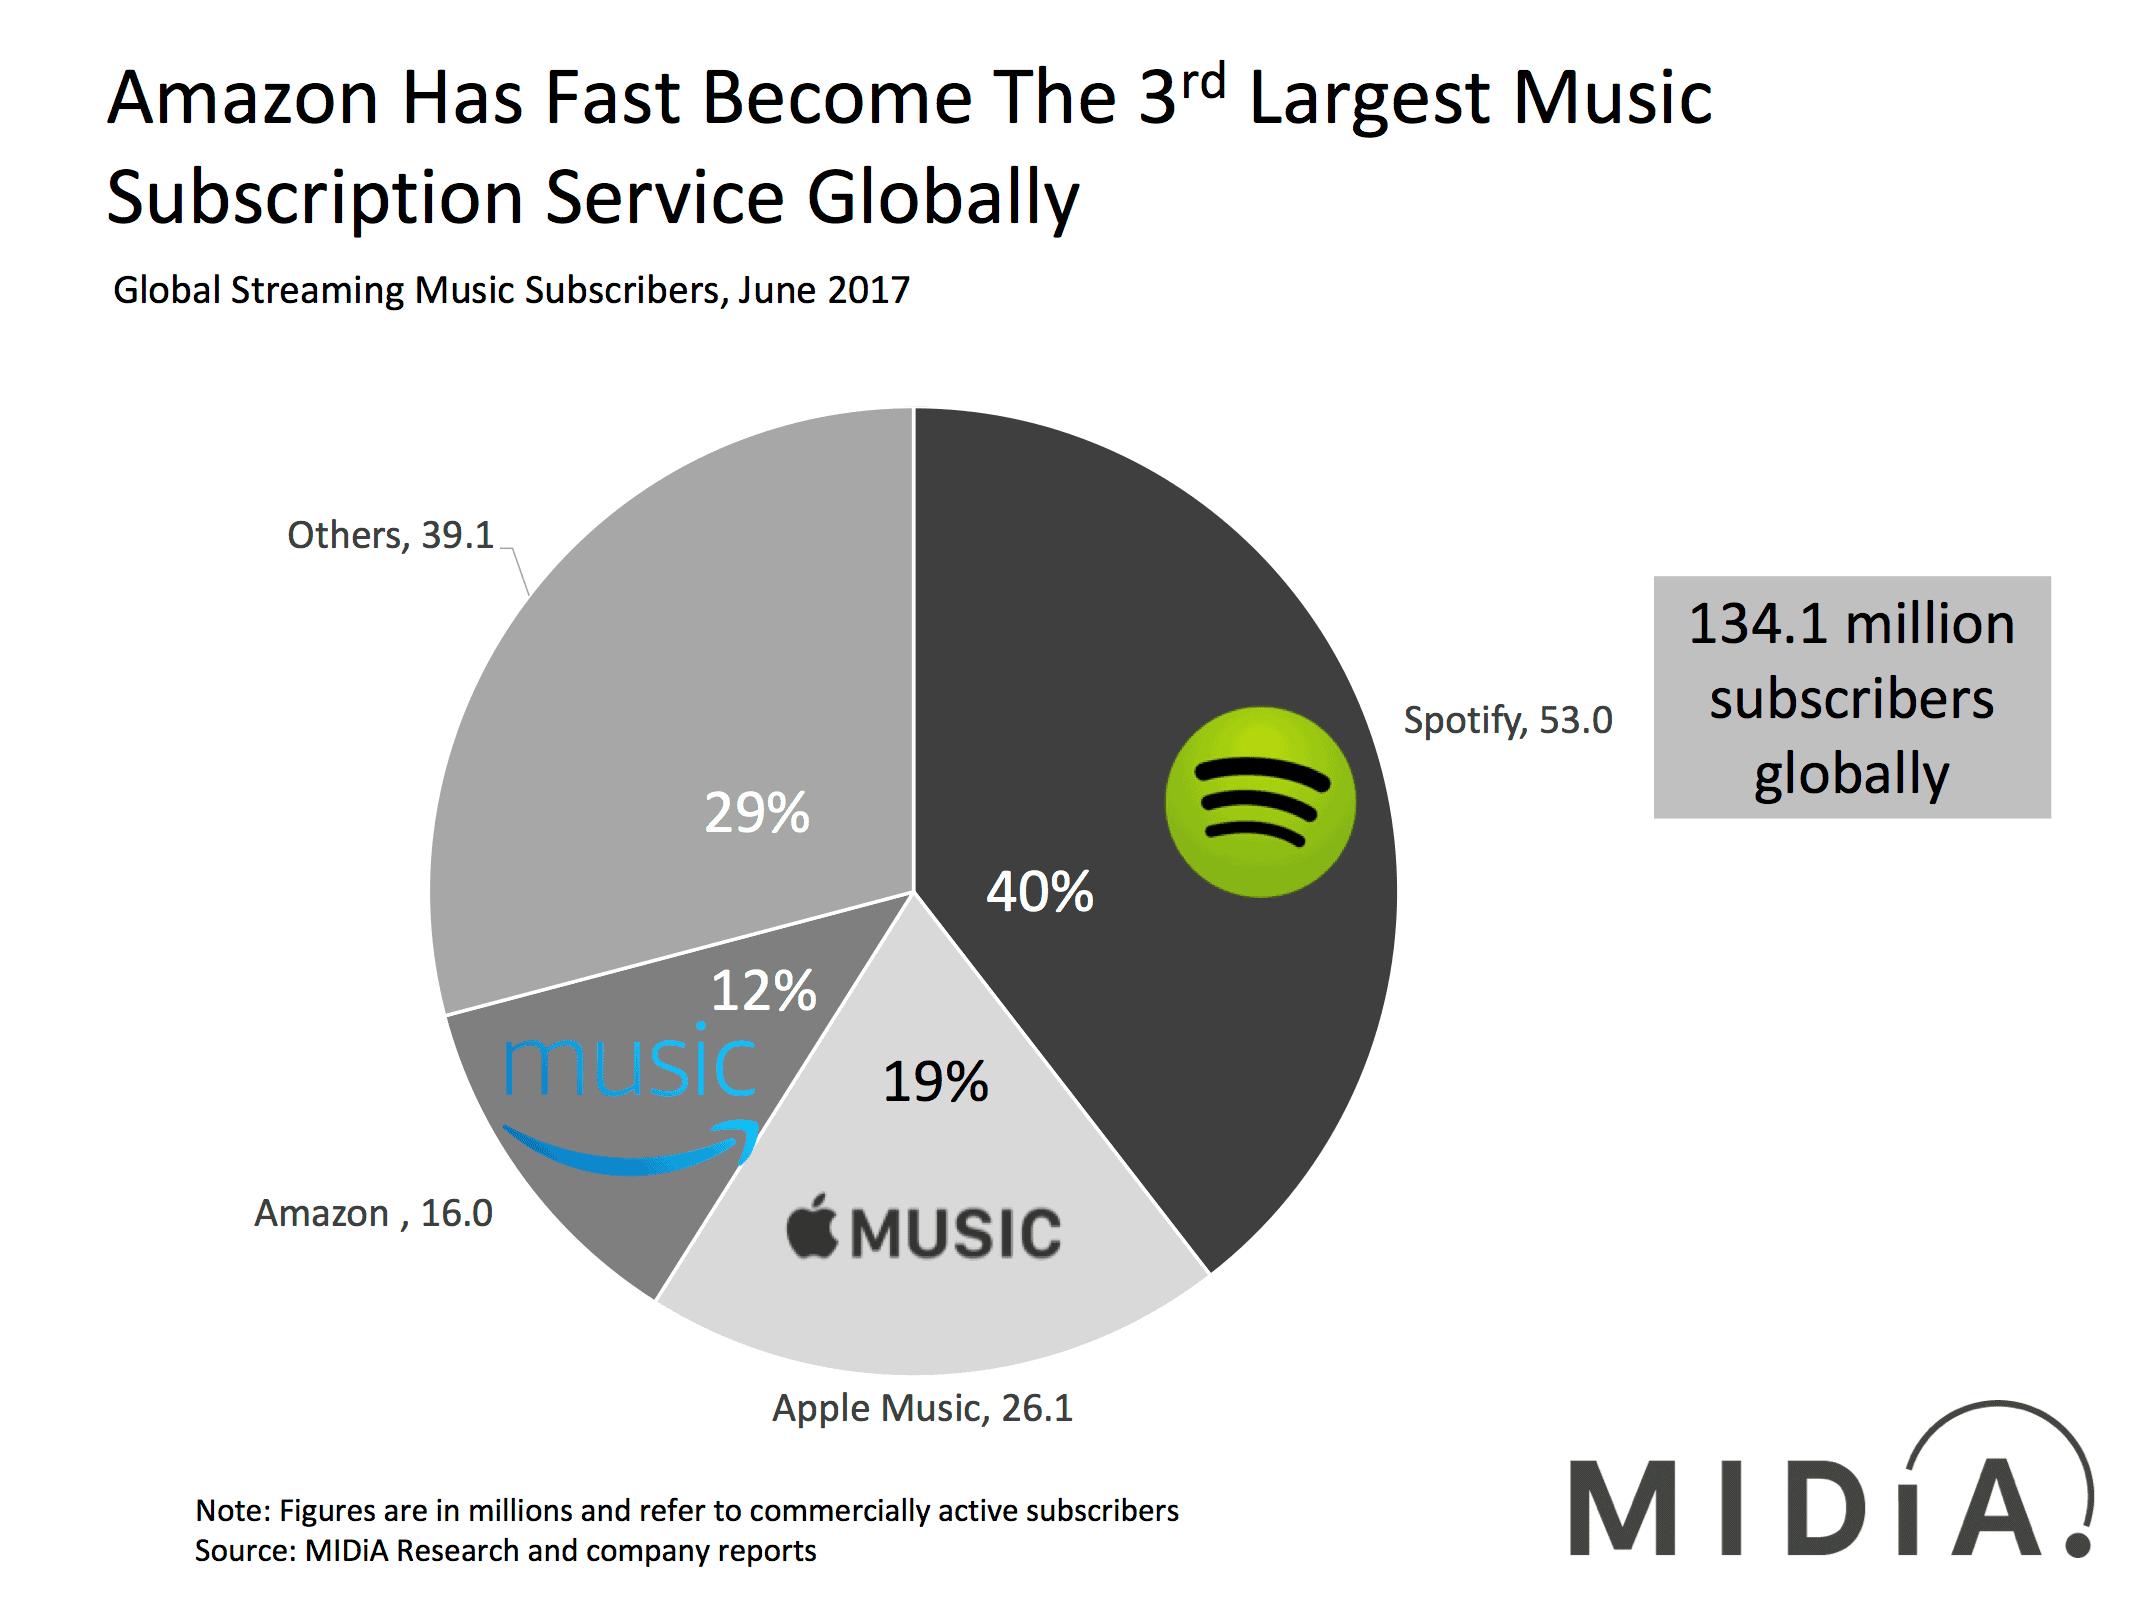 amazon music vs spotify